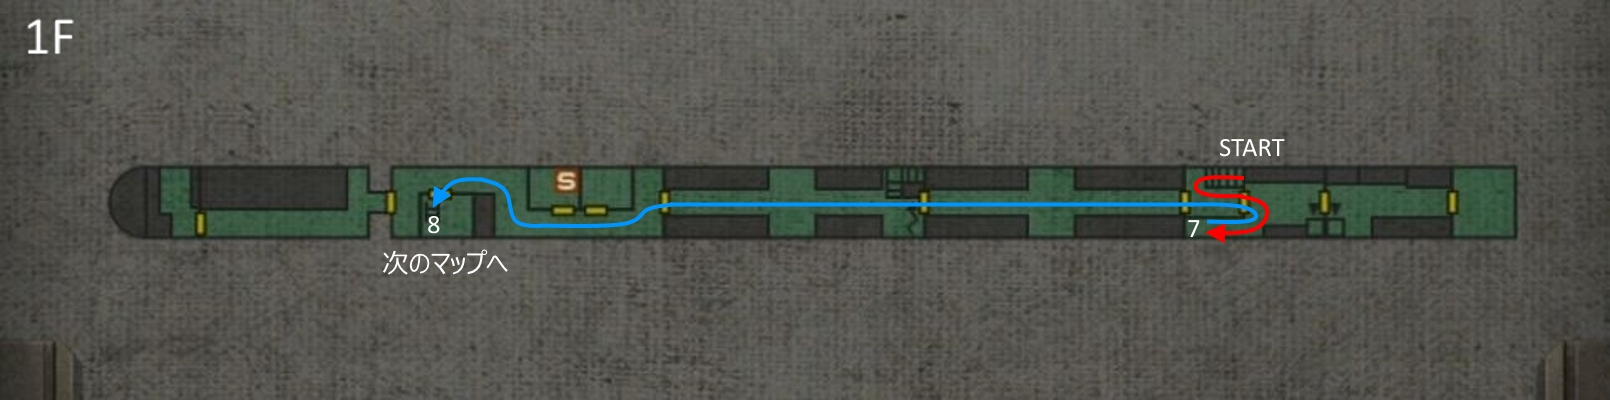 map_train05